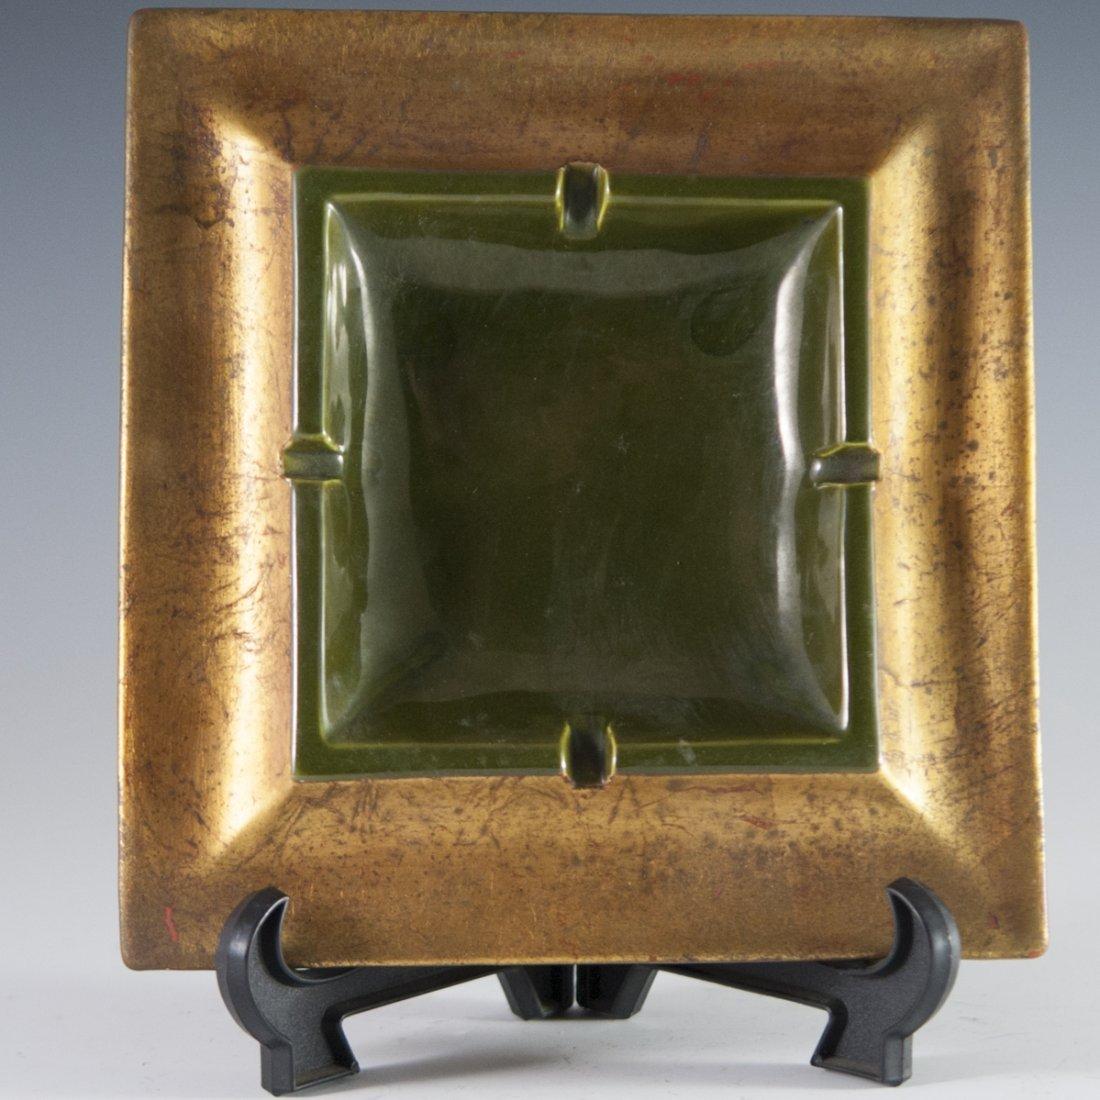 Freeman-Mcfarlin Ceramic Ashtray